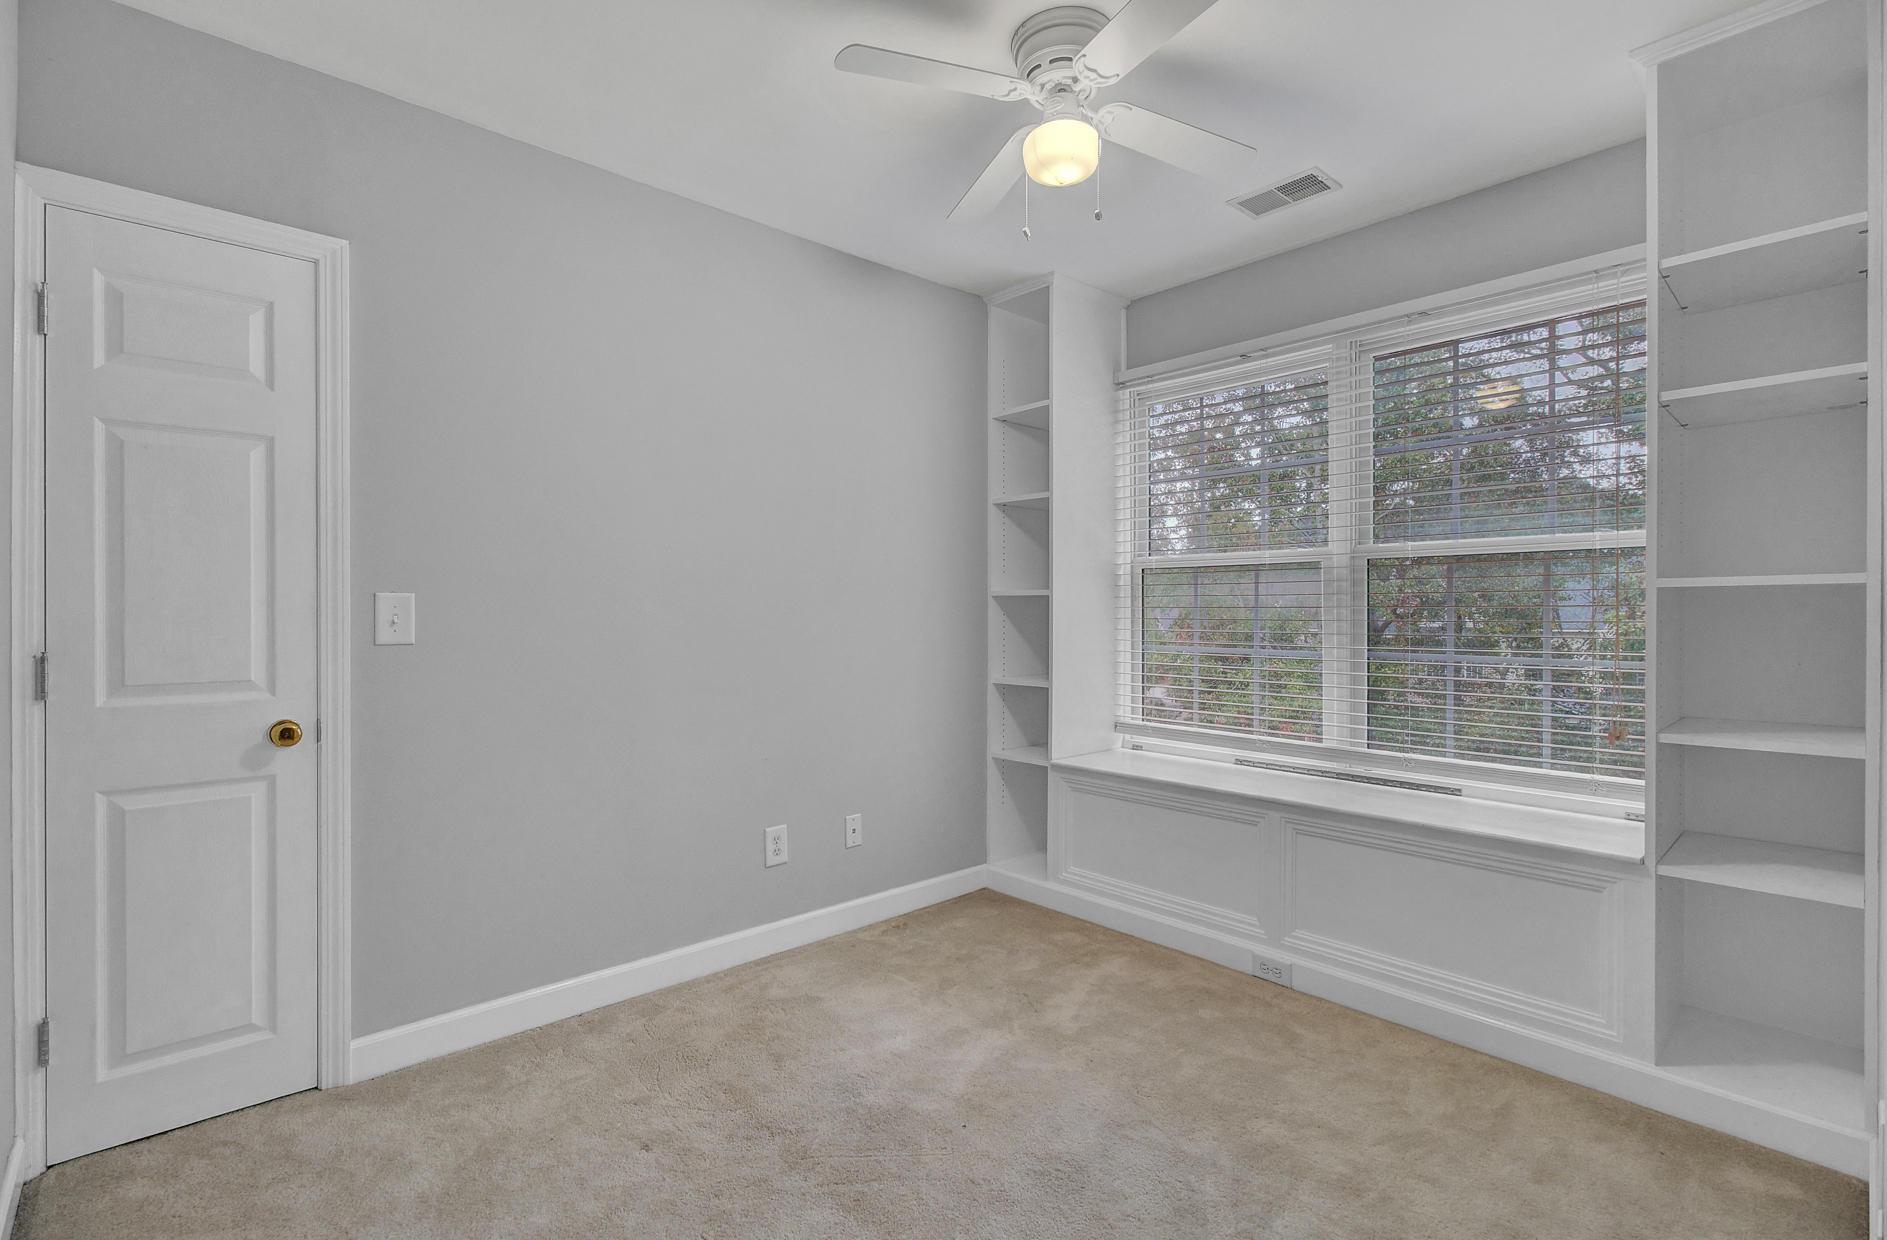 Dunes West Homes For Sale - 2321 Darts Cove, Mount Pleasant, SC - 29